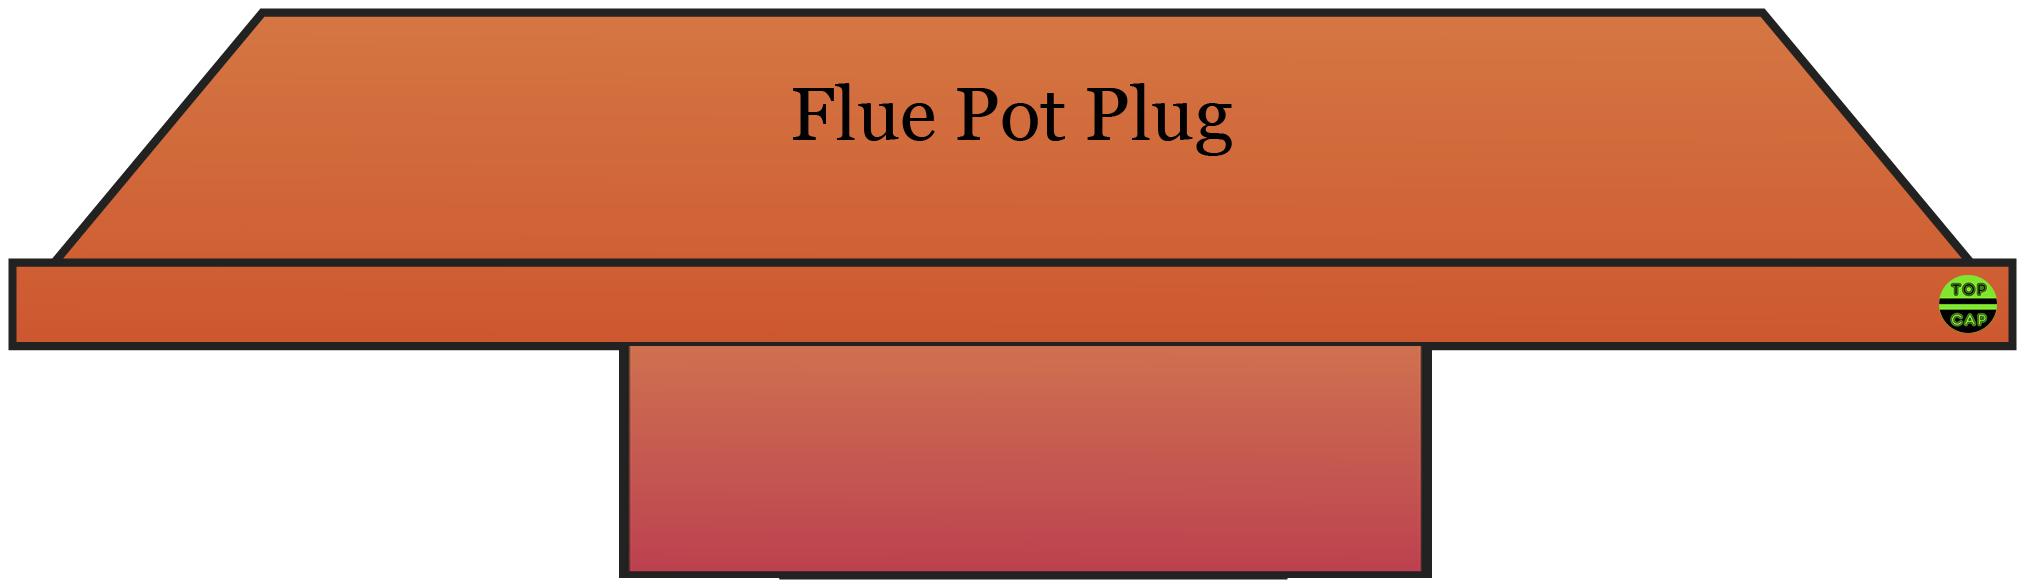 Flue Pot Plug